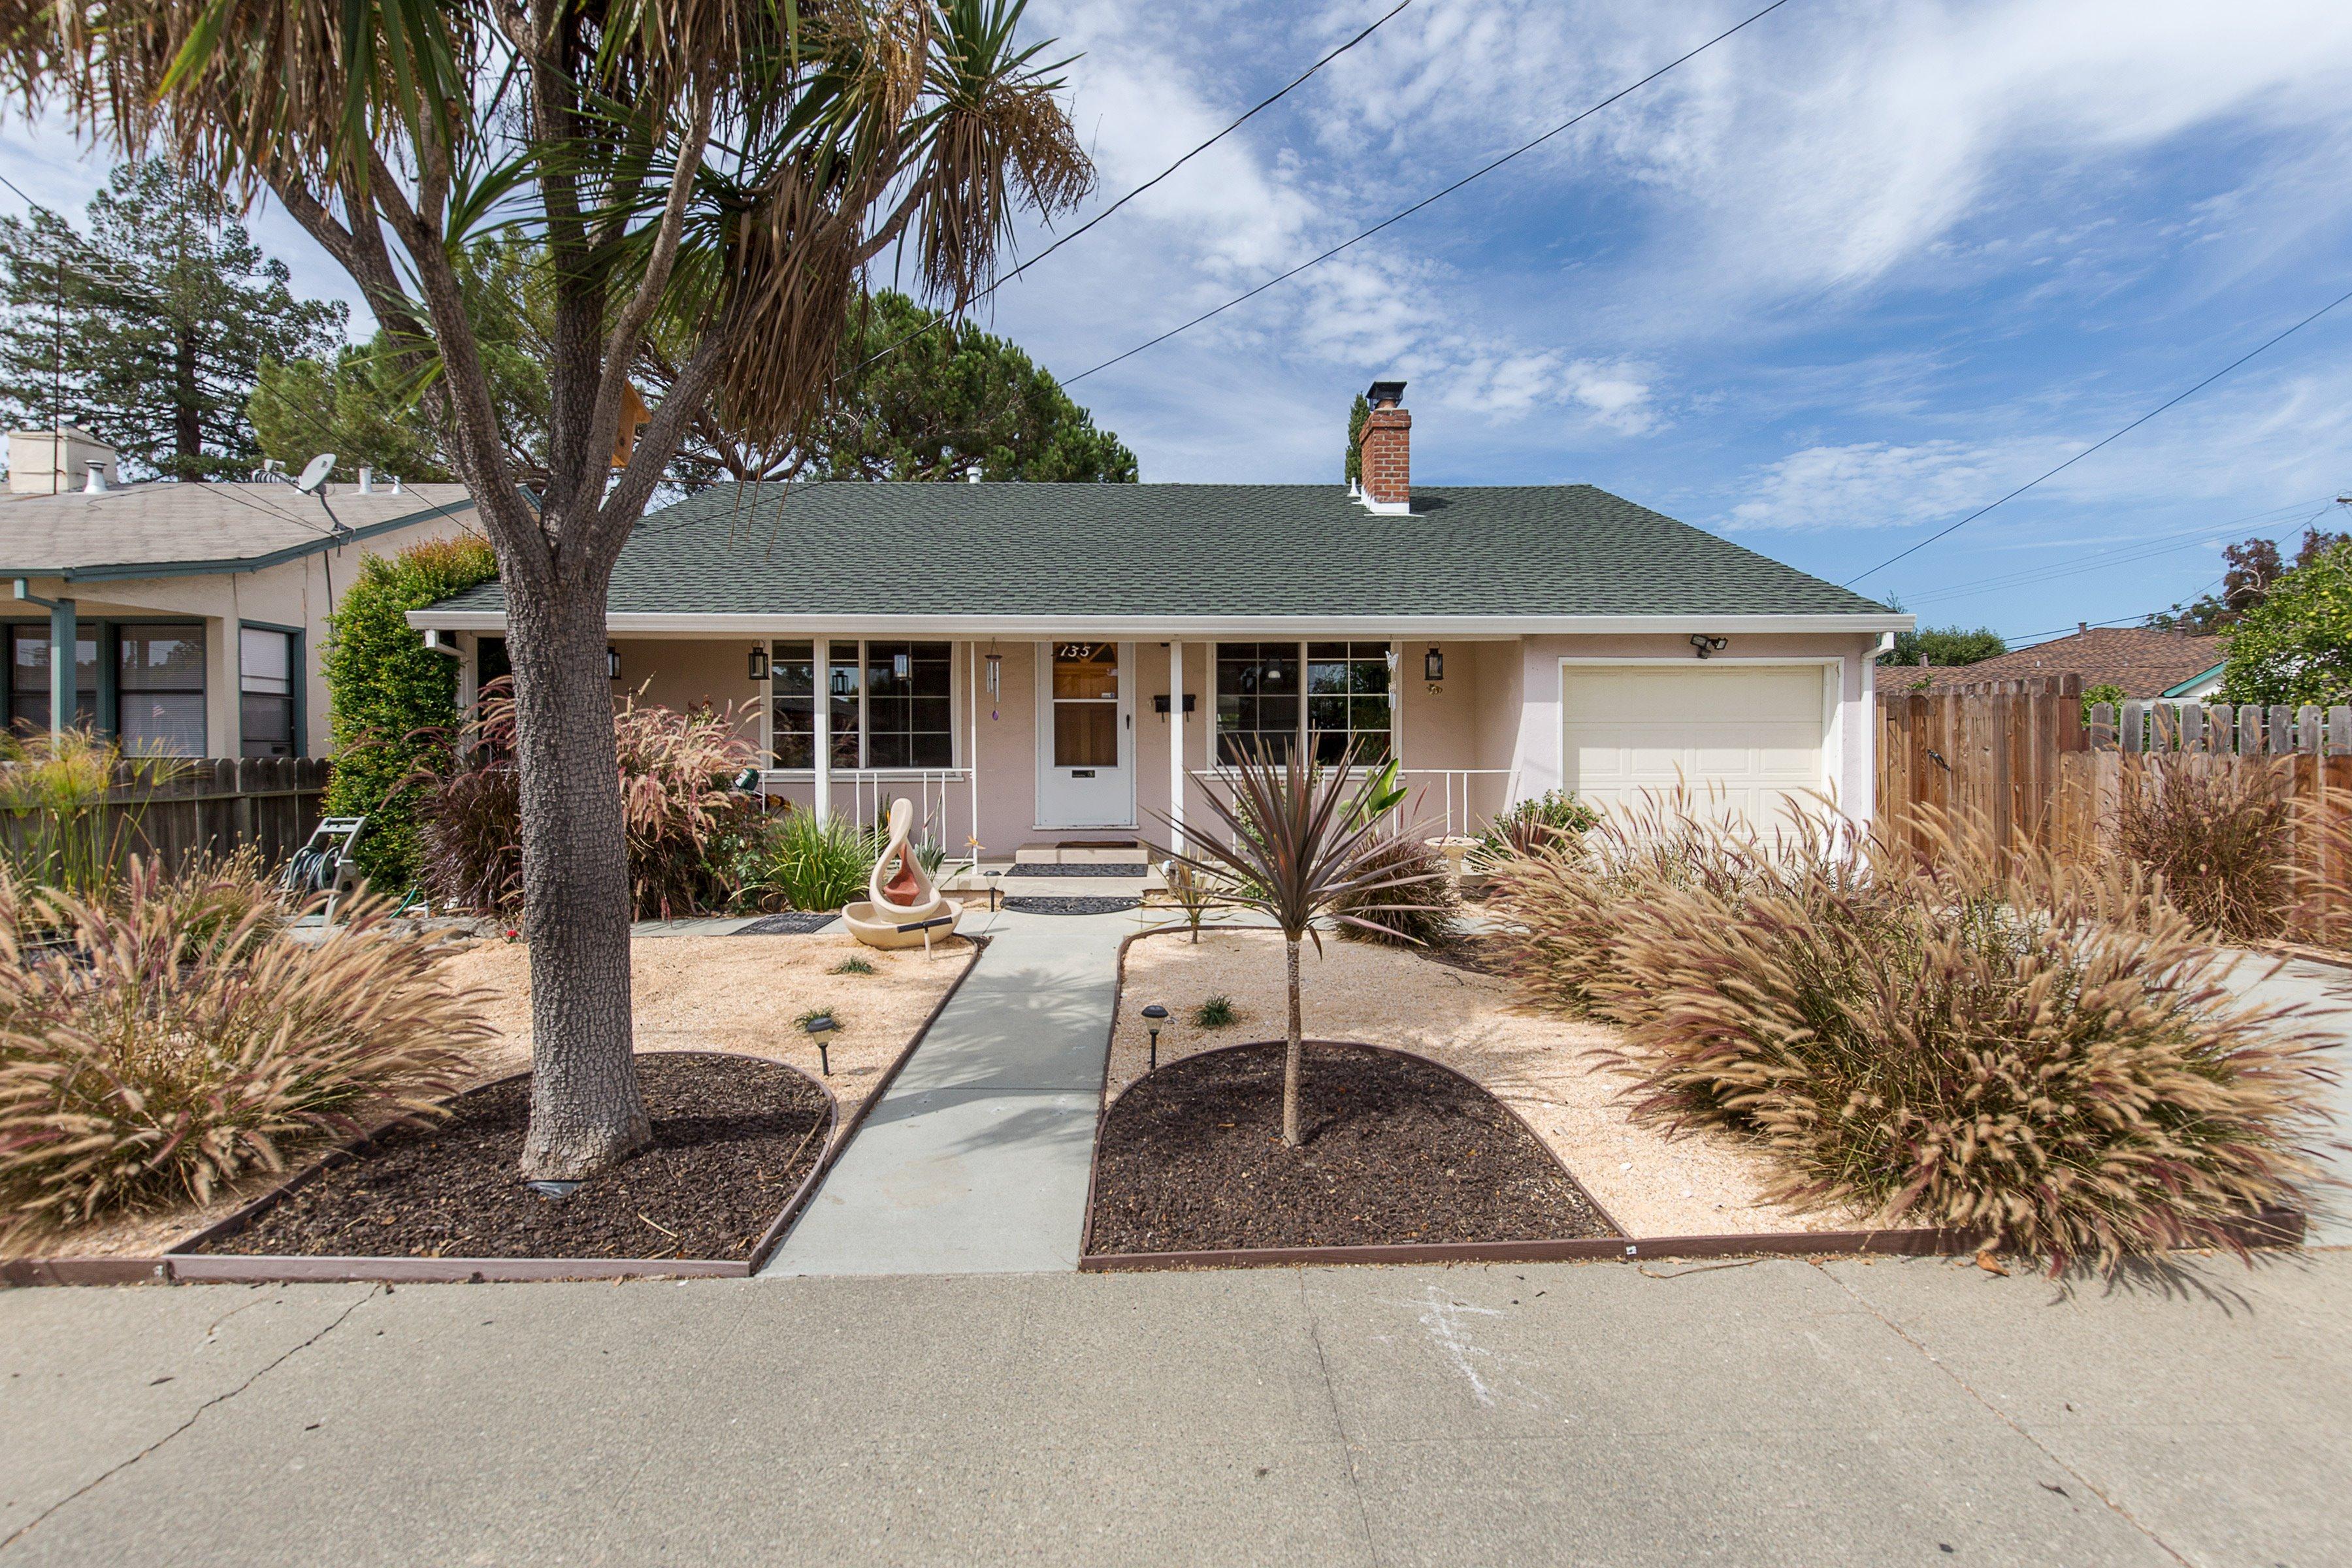 135 C St, Redwood City, CA 94063